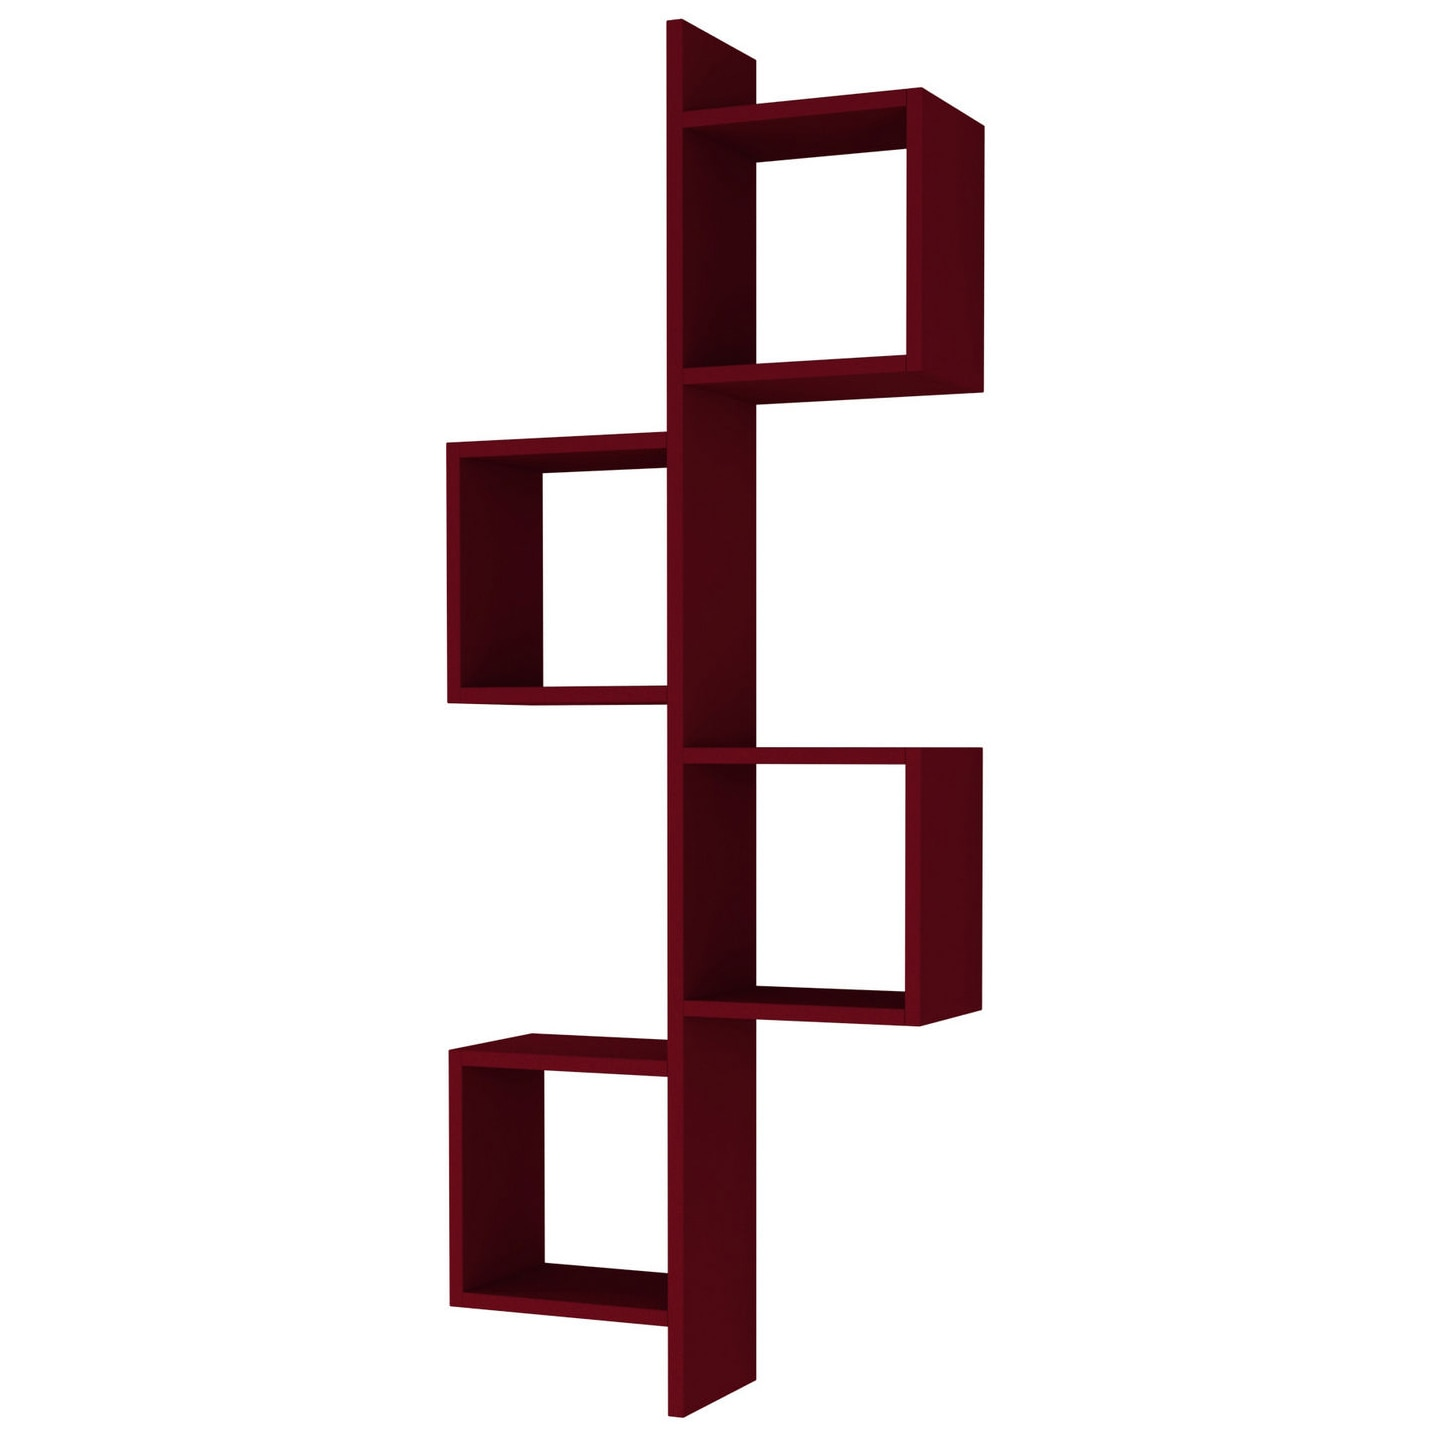 Fotografie Raft de perete Cling Homitis, 57.5 x 153.5 x 20 cm, rosu